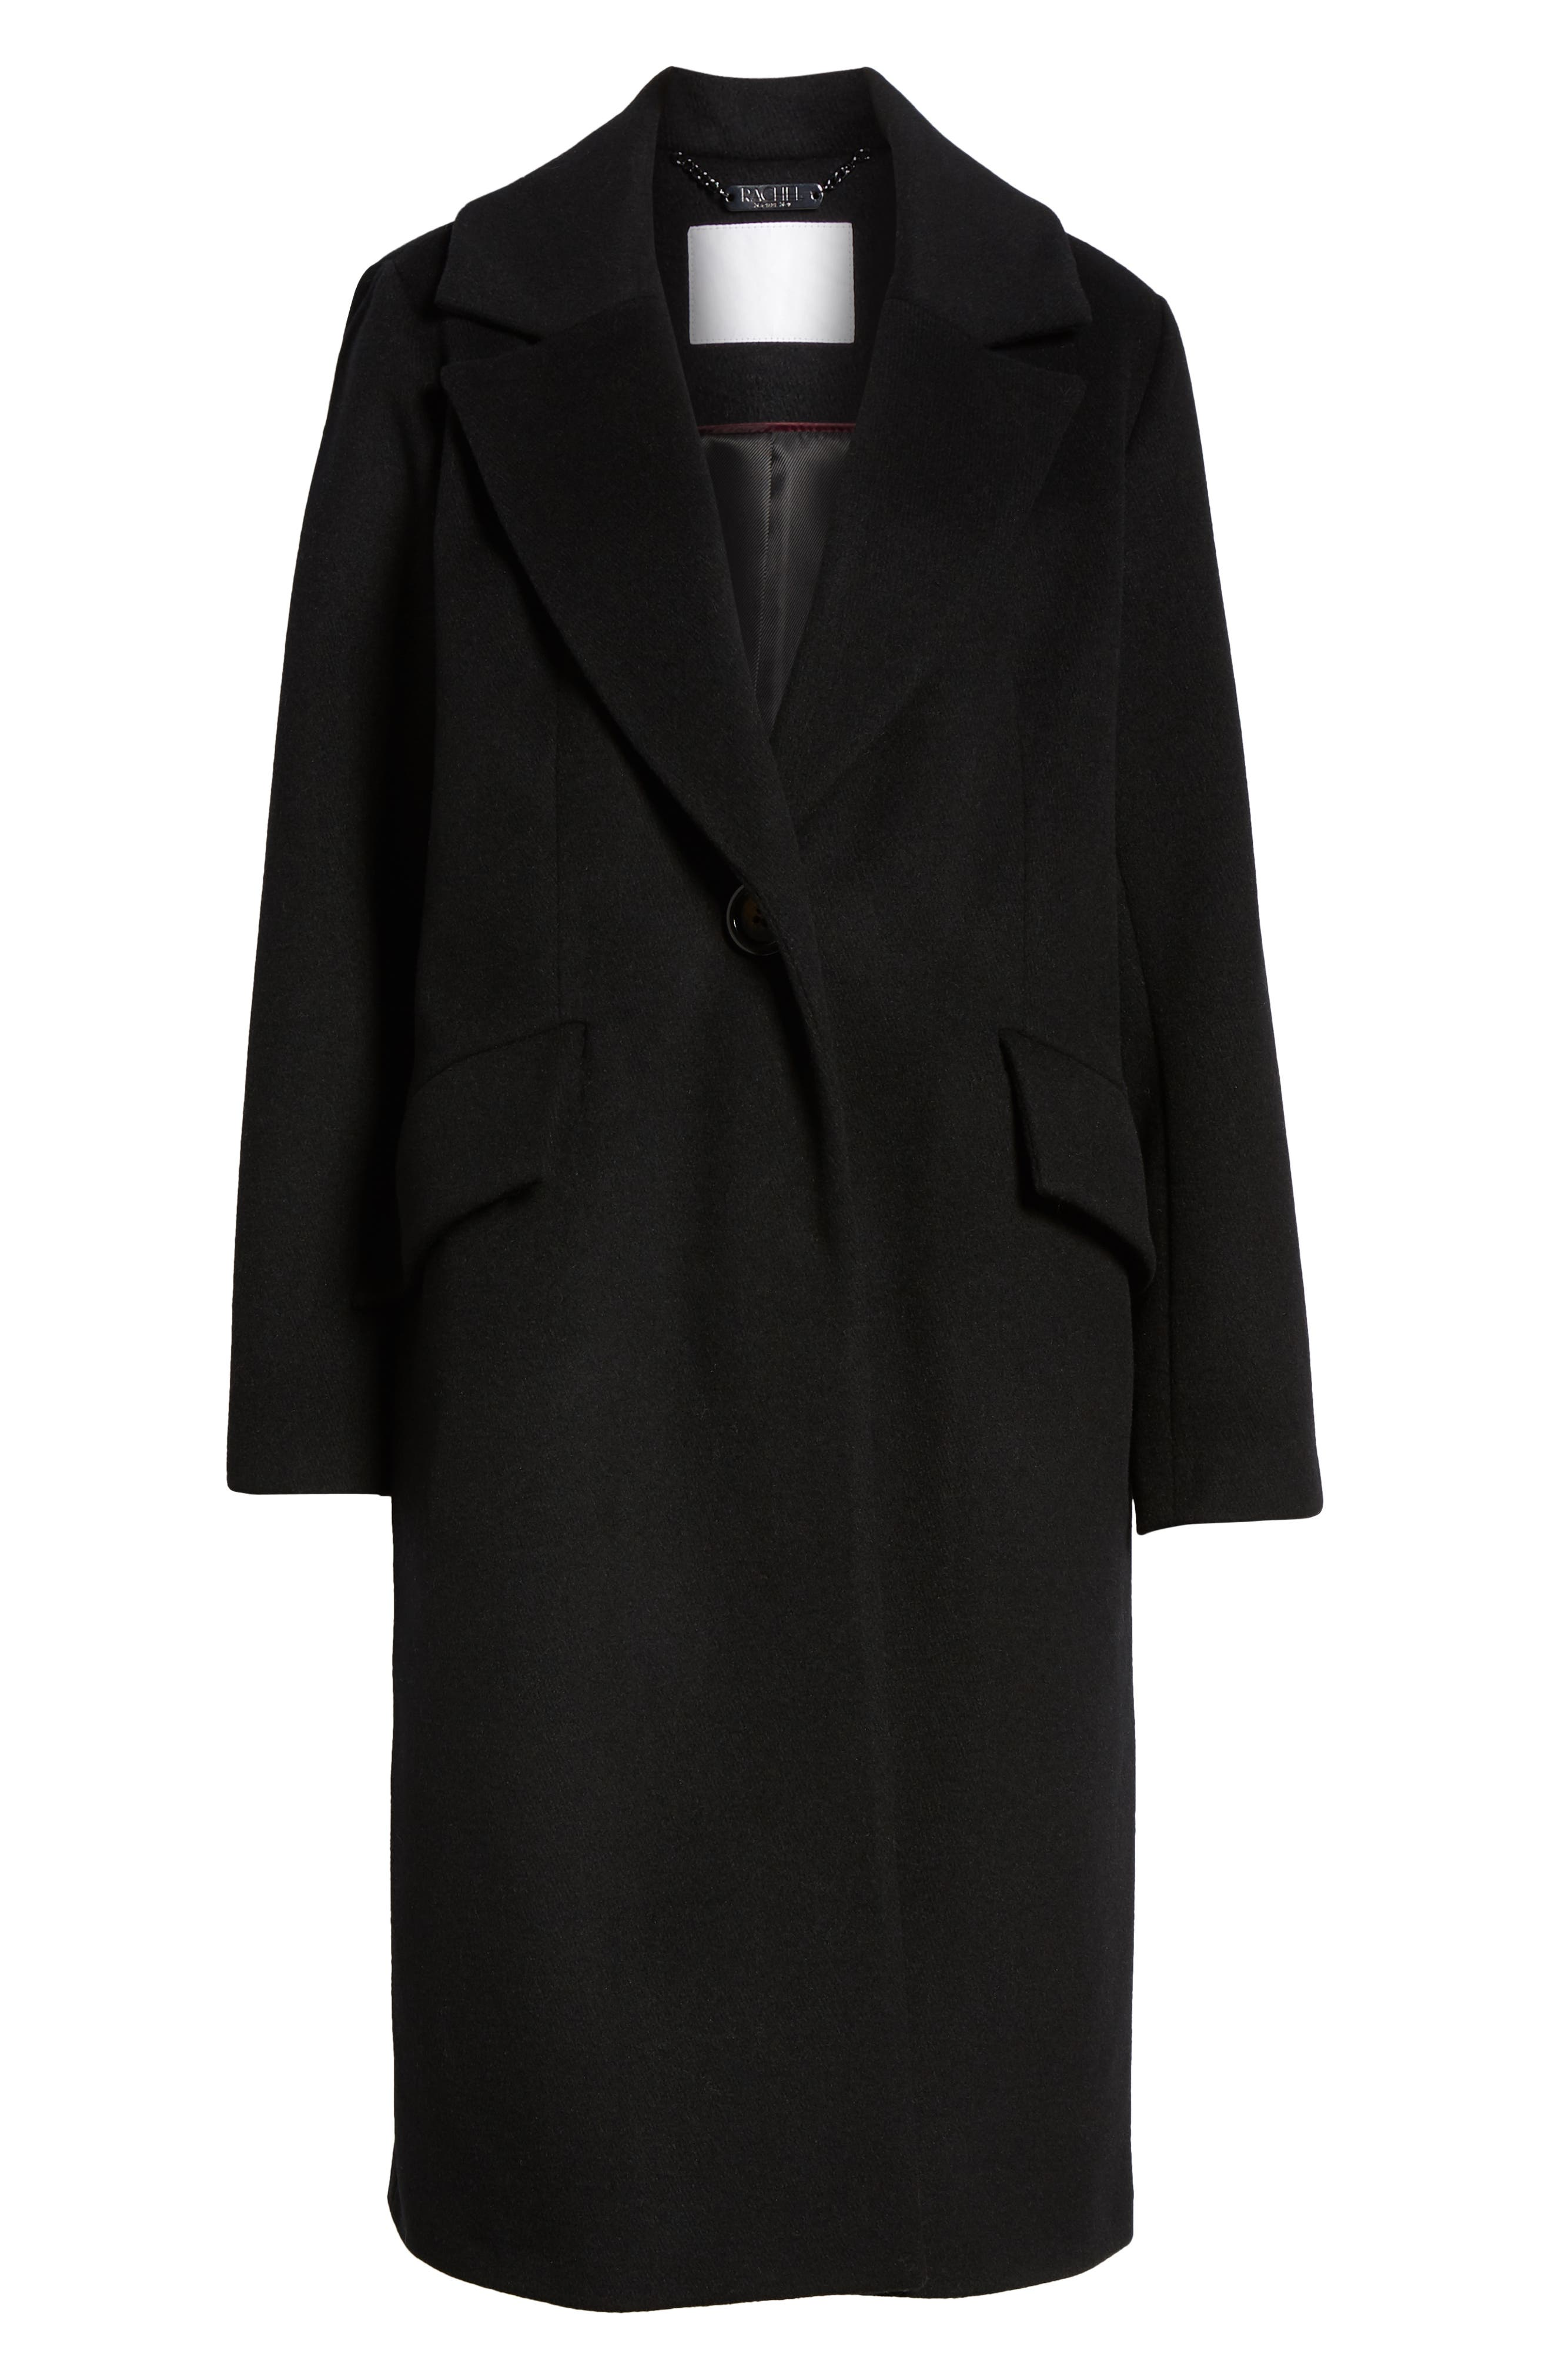 RACHEL RACHEL ROY, Wool Blend Coat, Alternate thumbnail 6, color, BLACK